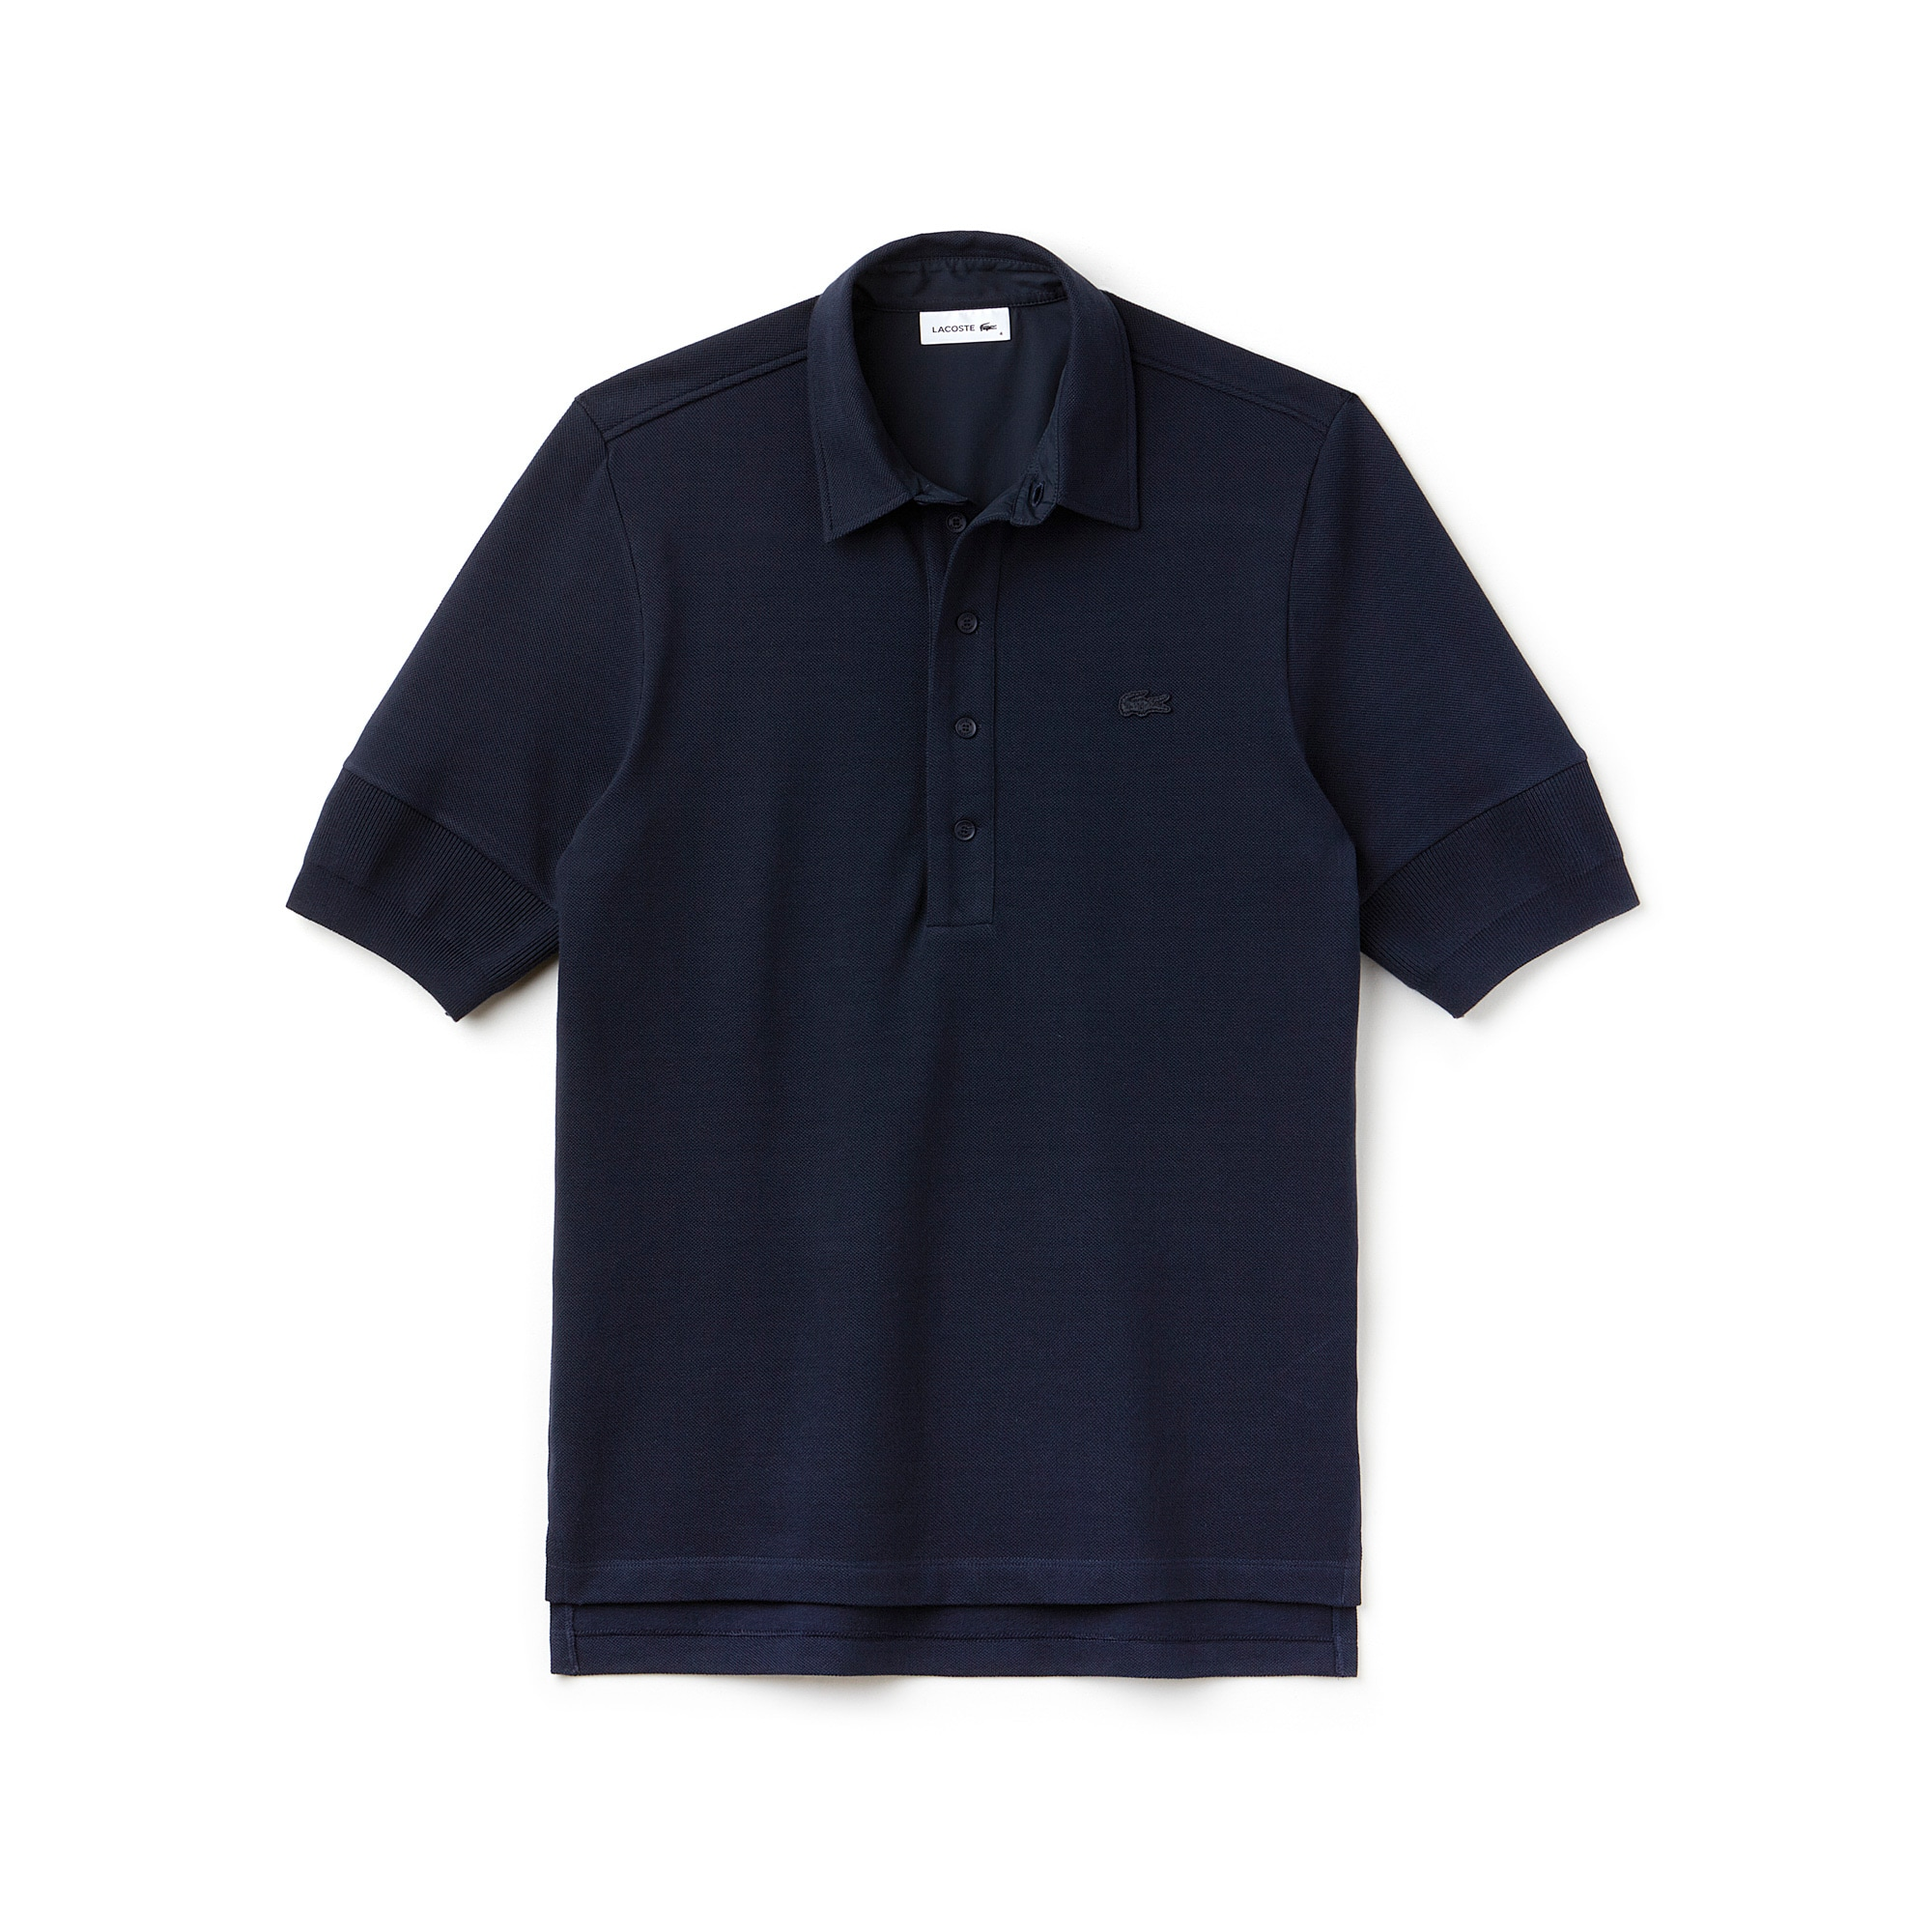 MEN'S LACOSTE FASHION SHOW Angerautes Poloshirt aus Baumwollpiqué